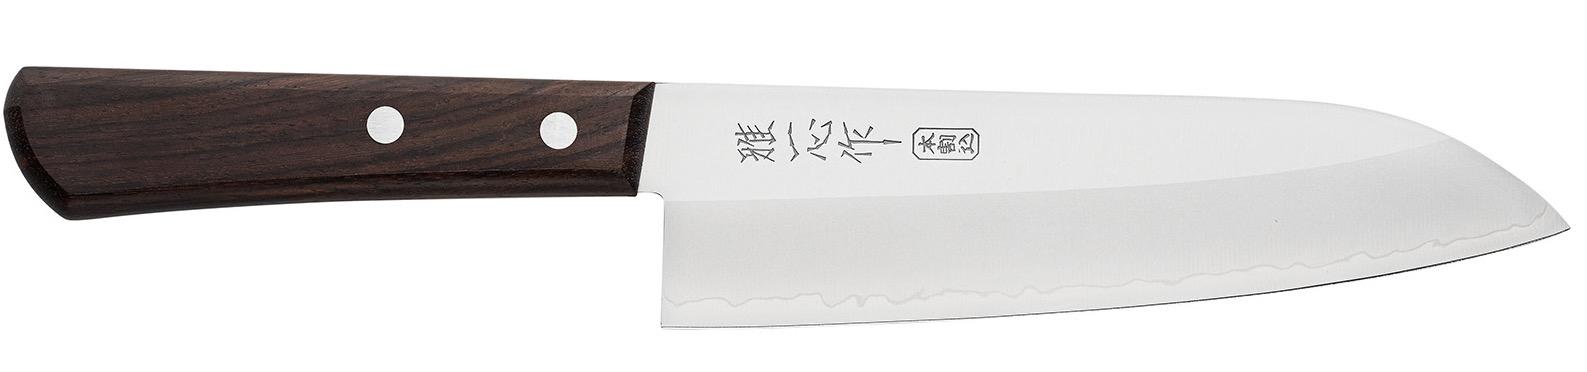 Kanetsugo Myabi Issi 3-Lagenstahl Messer